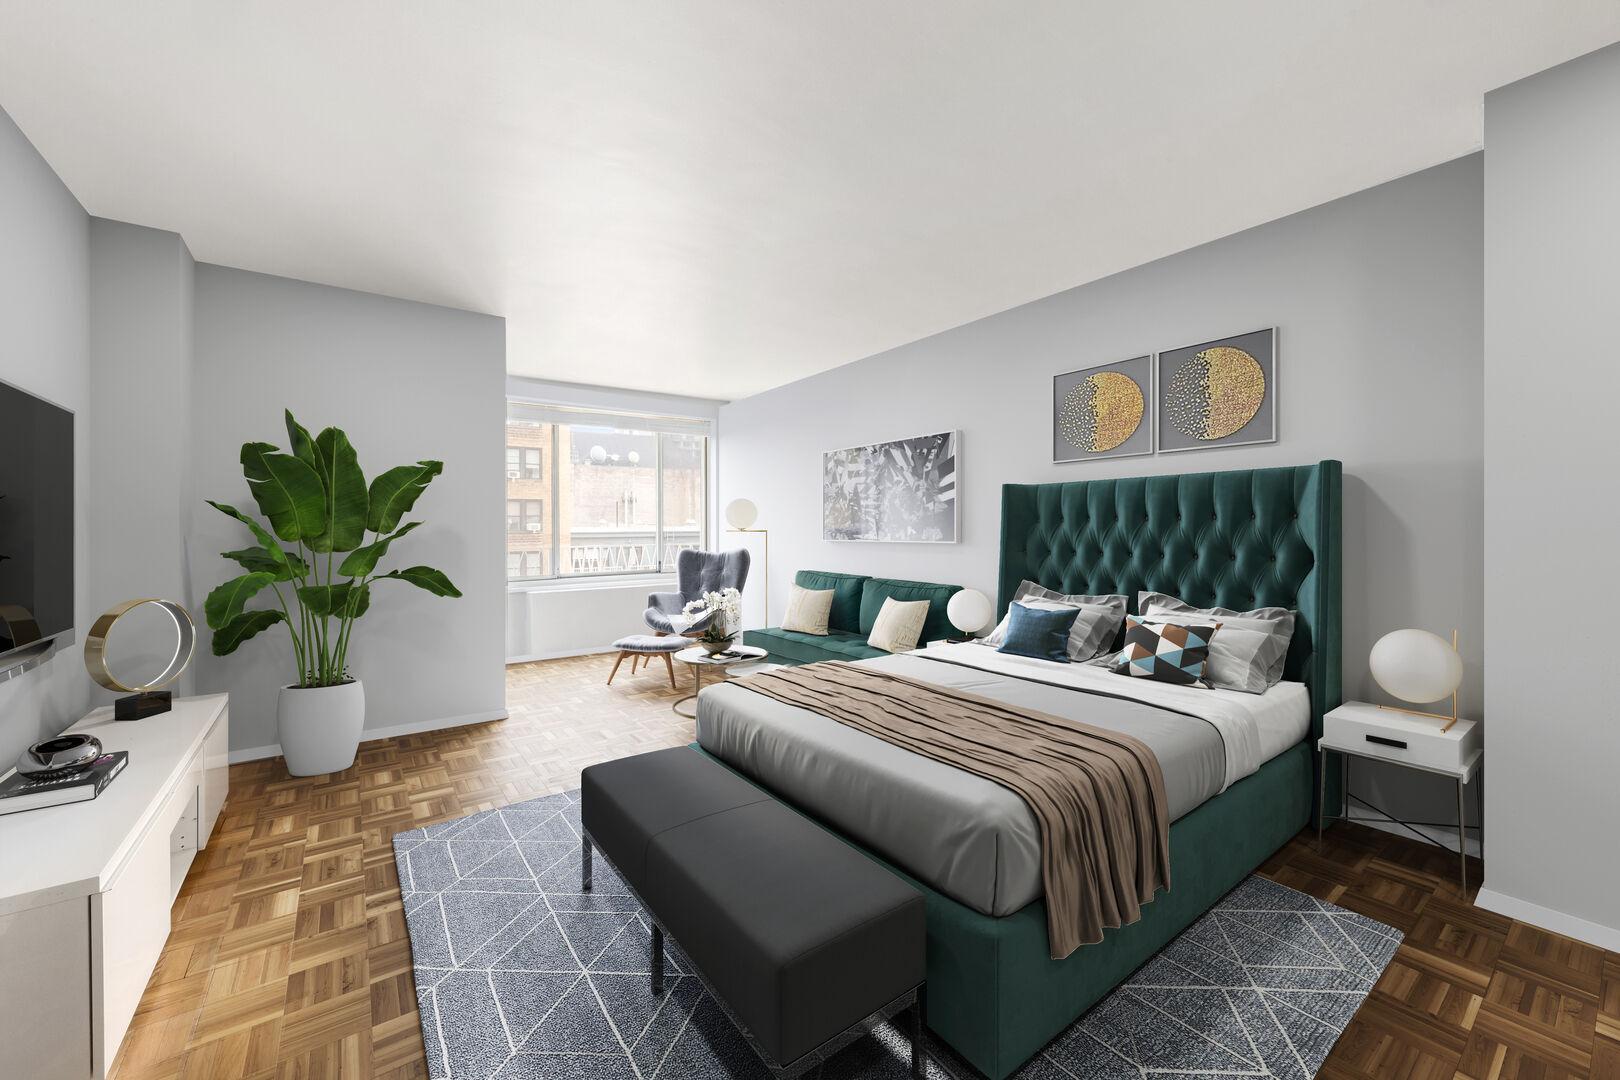 Apartment for sale at 1160 Third Avenue, Apt 10-G